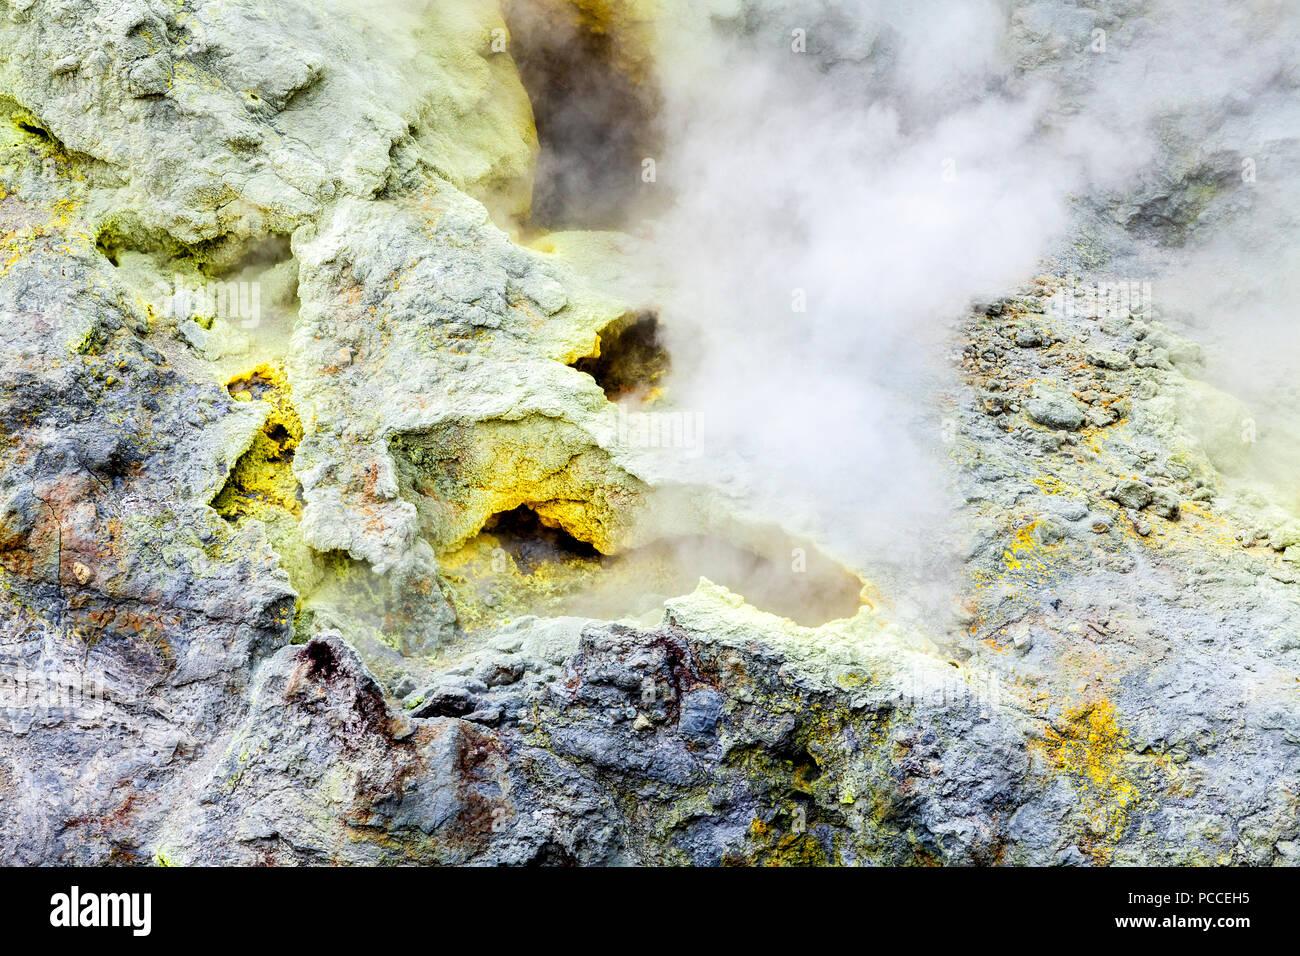 Steam, sulfuric, active fumaroles near the Mutnovsky volcano, Kamchatka peninsula, Russia - Stock Image